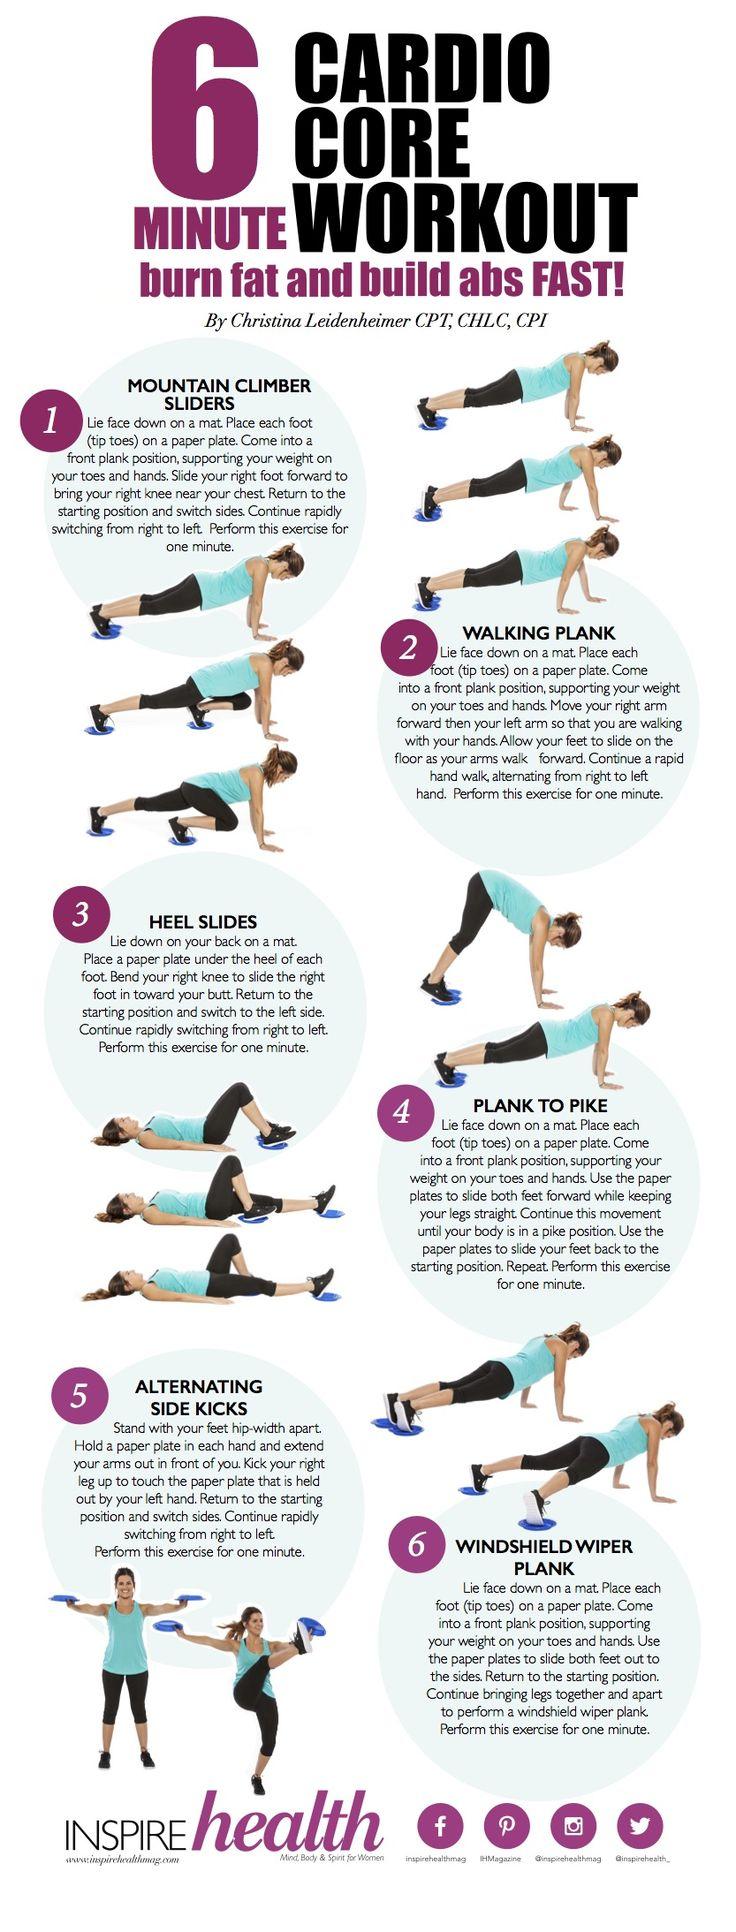 6 Minute Cardio Core Workout - Inspire Health Magazine